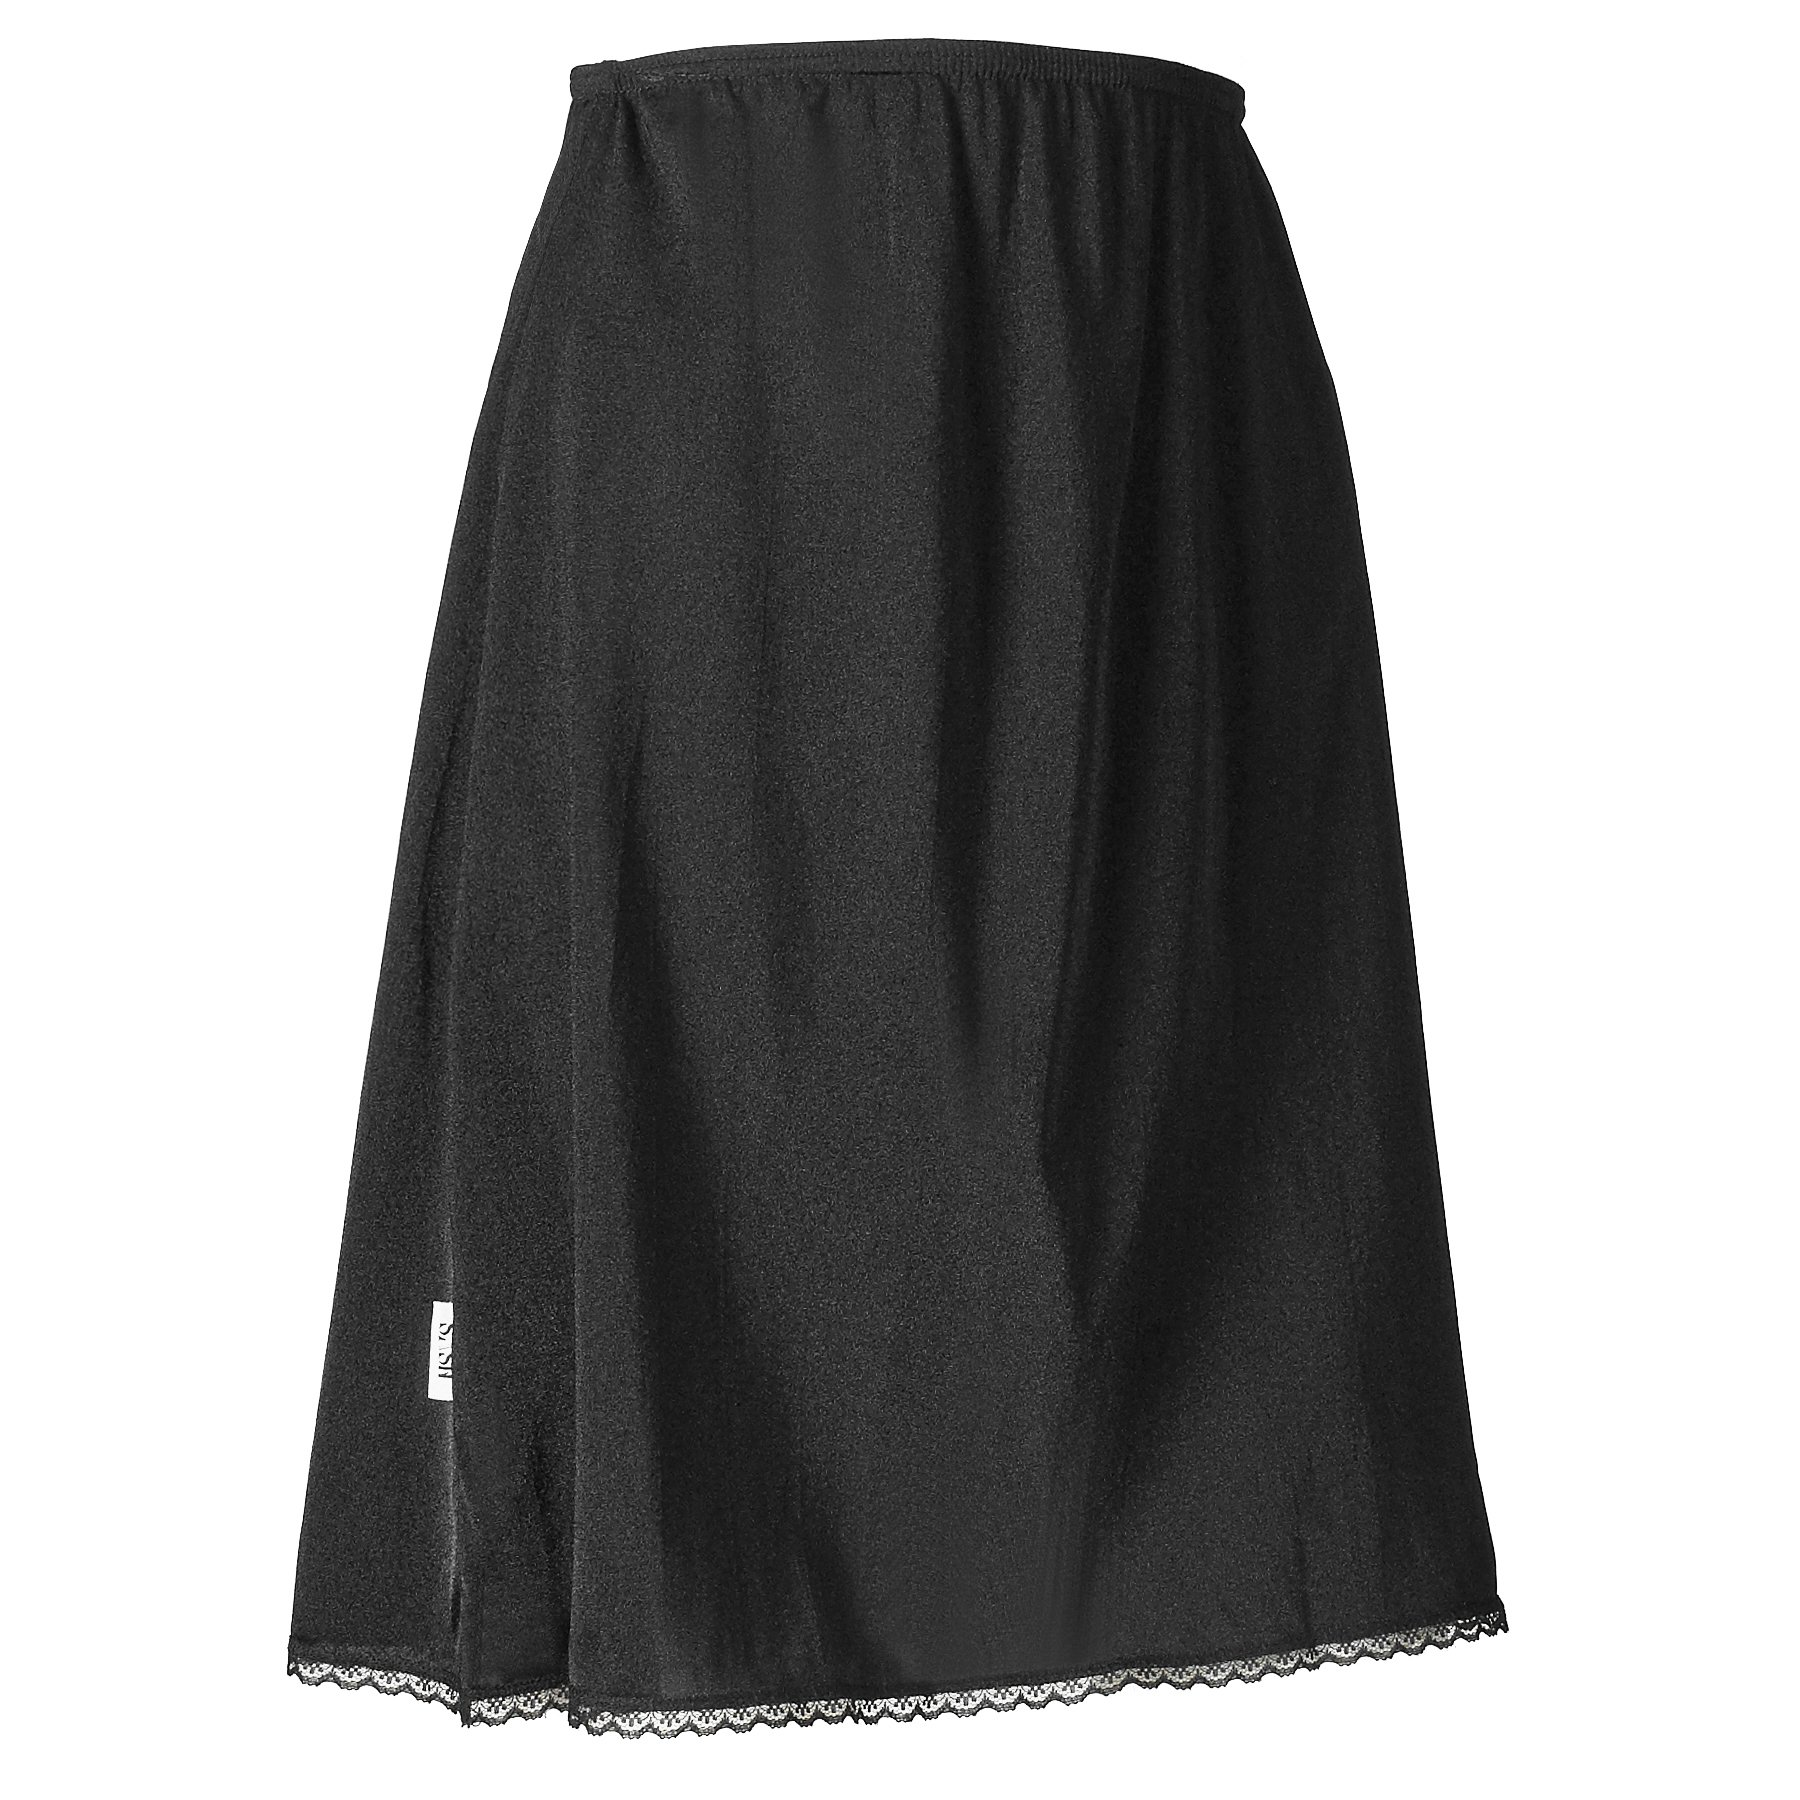 Sash Women's Classic Half Slip Dress for Ladies and Girls - Slight Flare - Anti Static - Black